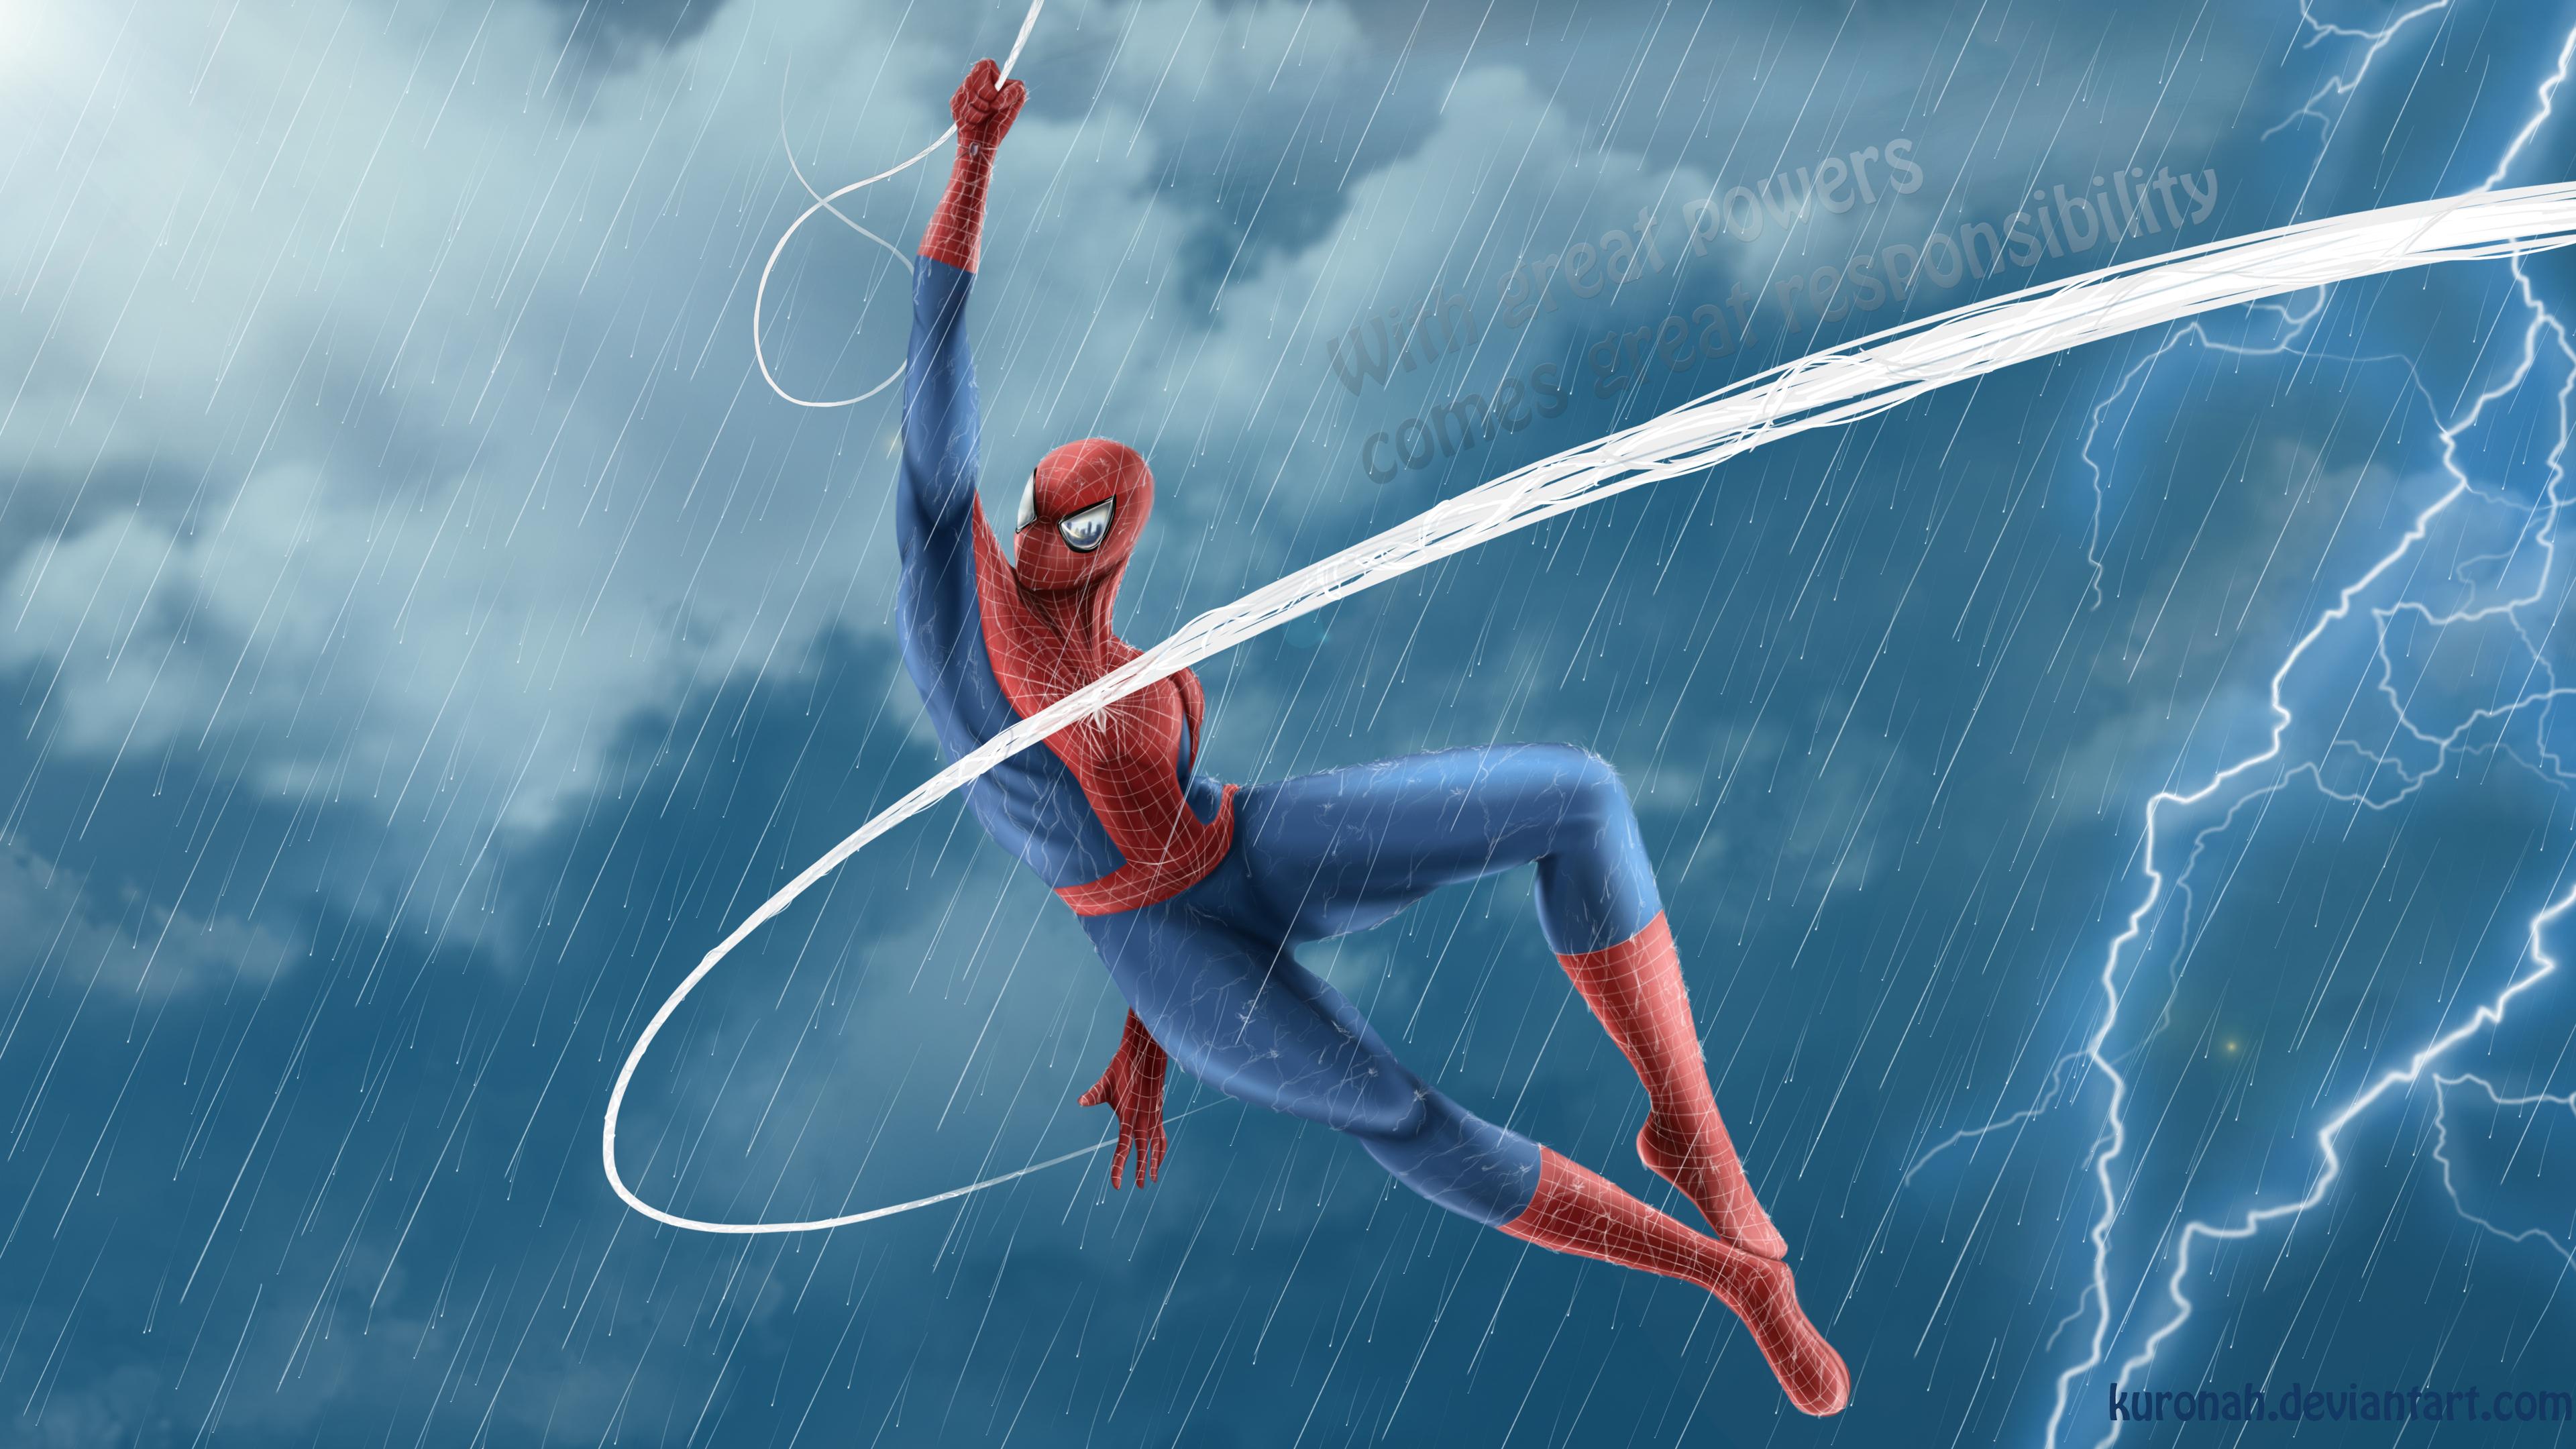 spiderman web 4k 1553071363 - Spiderman Web 4k - superheroes wallpapers, spiderman wallpapers, hd-wallpapers, digital art wallpapers, deviantart wallpapers, artwork wallpapers, artist wallpapers, 4k-wallpapers